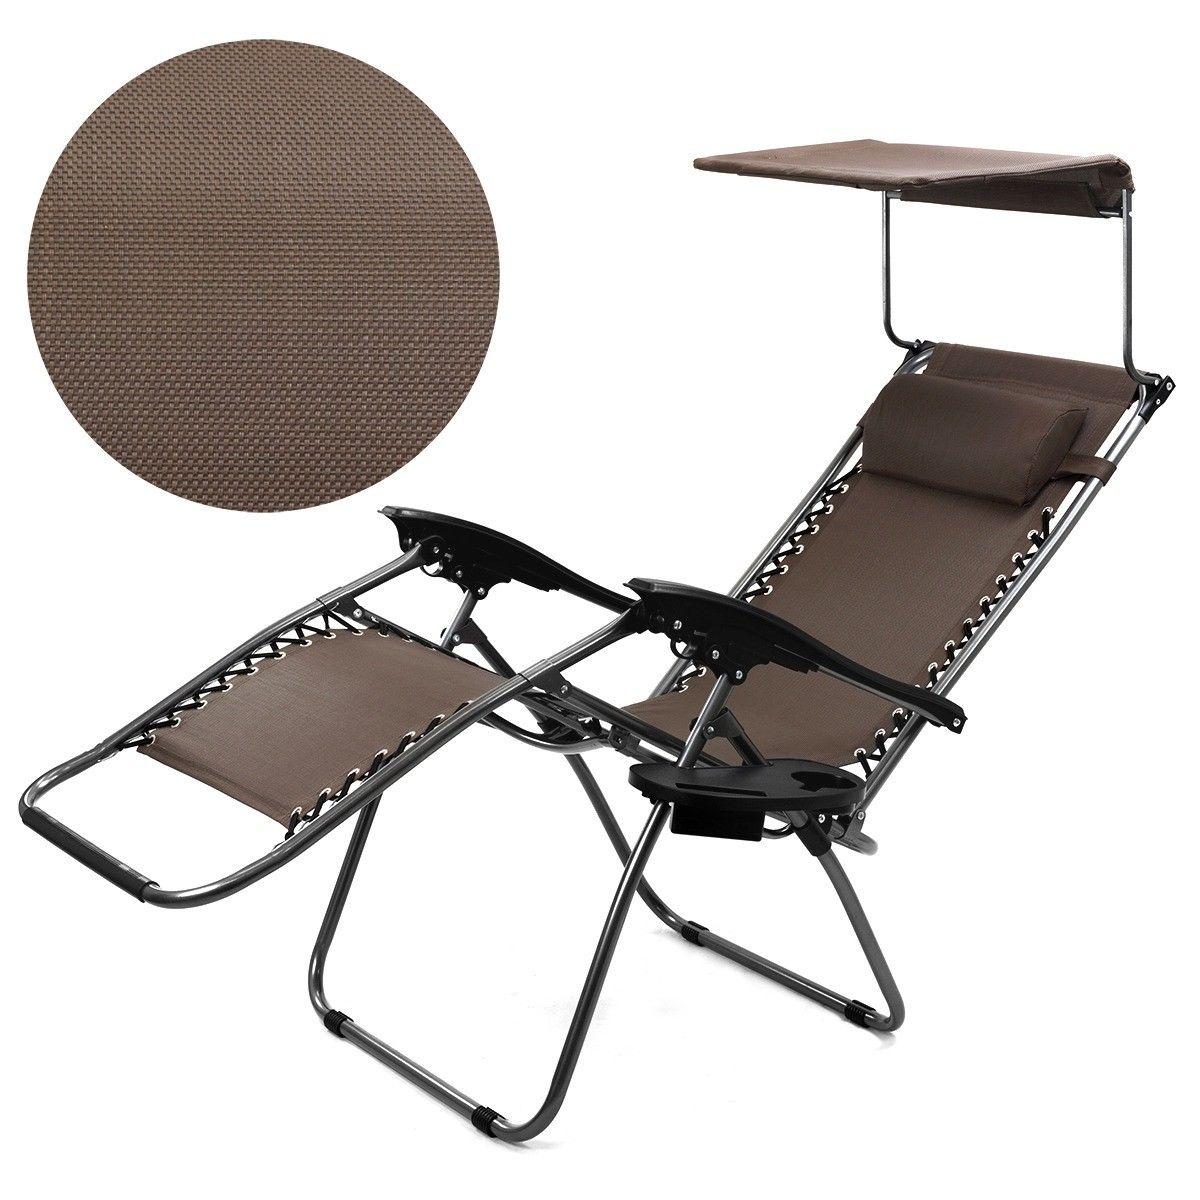 Zero Gravity Lounge Chair Canopy Sun Shade Cup Holder